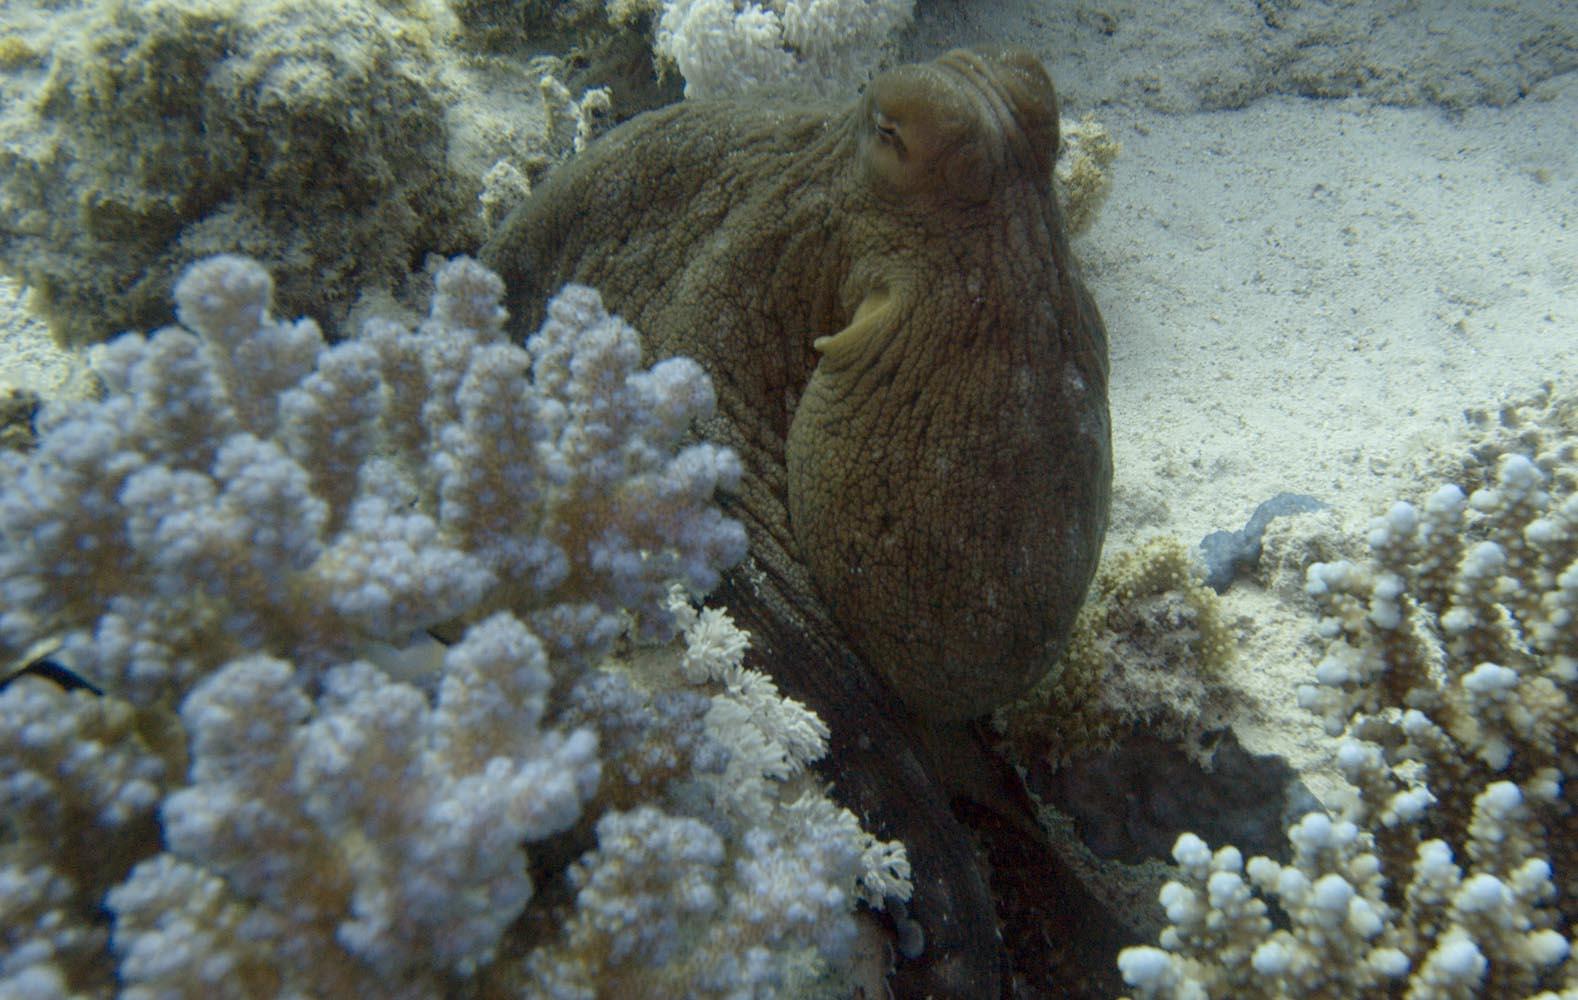 Marsa_Alam_Marsa_Shagra_Red Sea Diving Safari-24